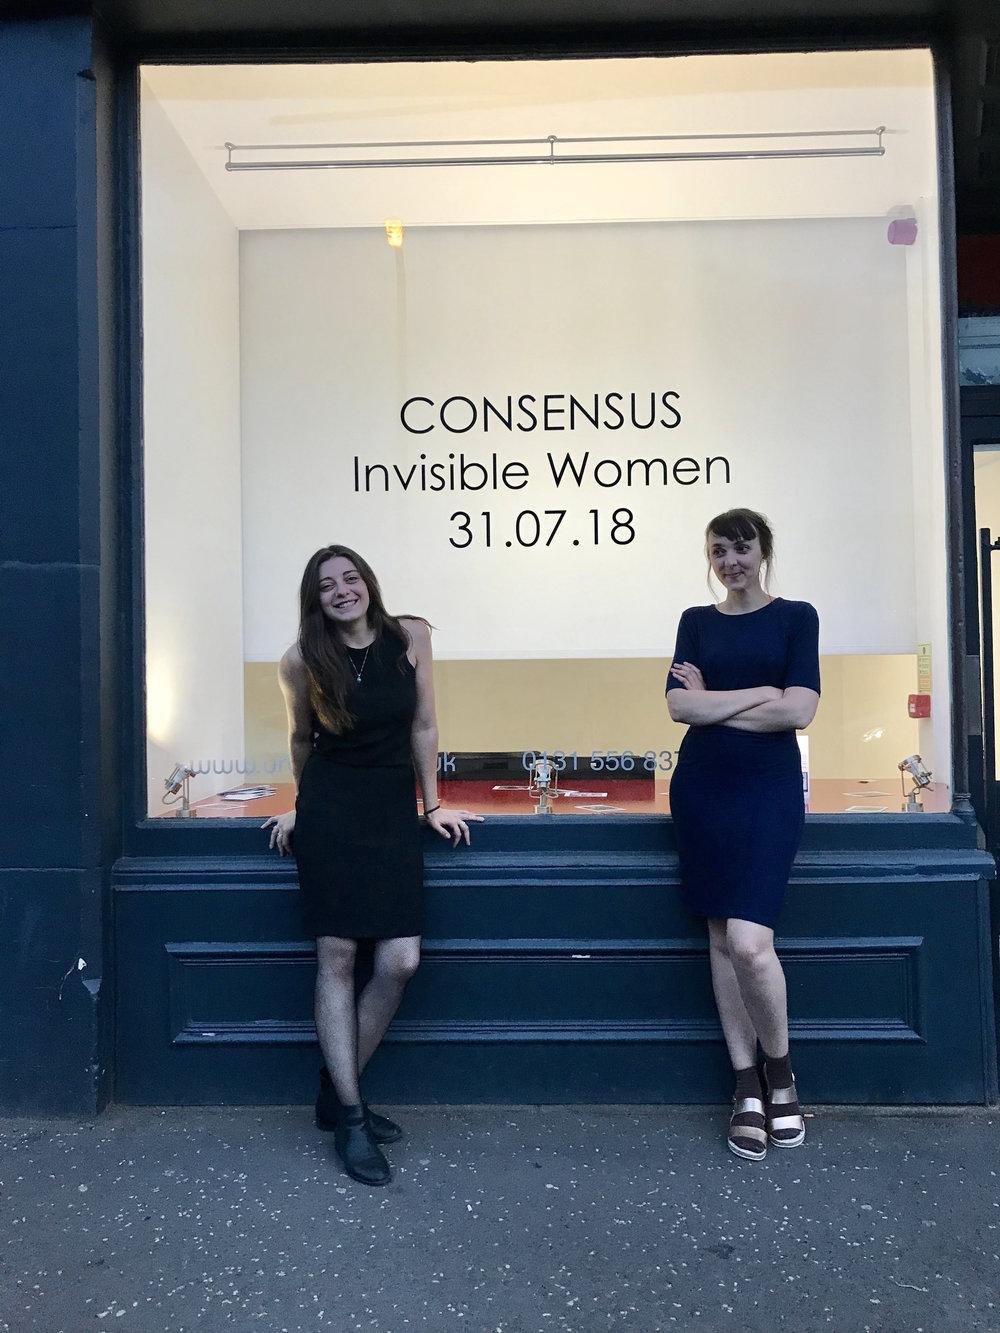 Invisible women - urbane art gallery - consensus.jpg